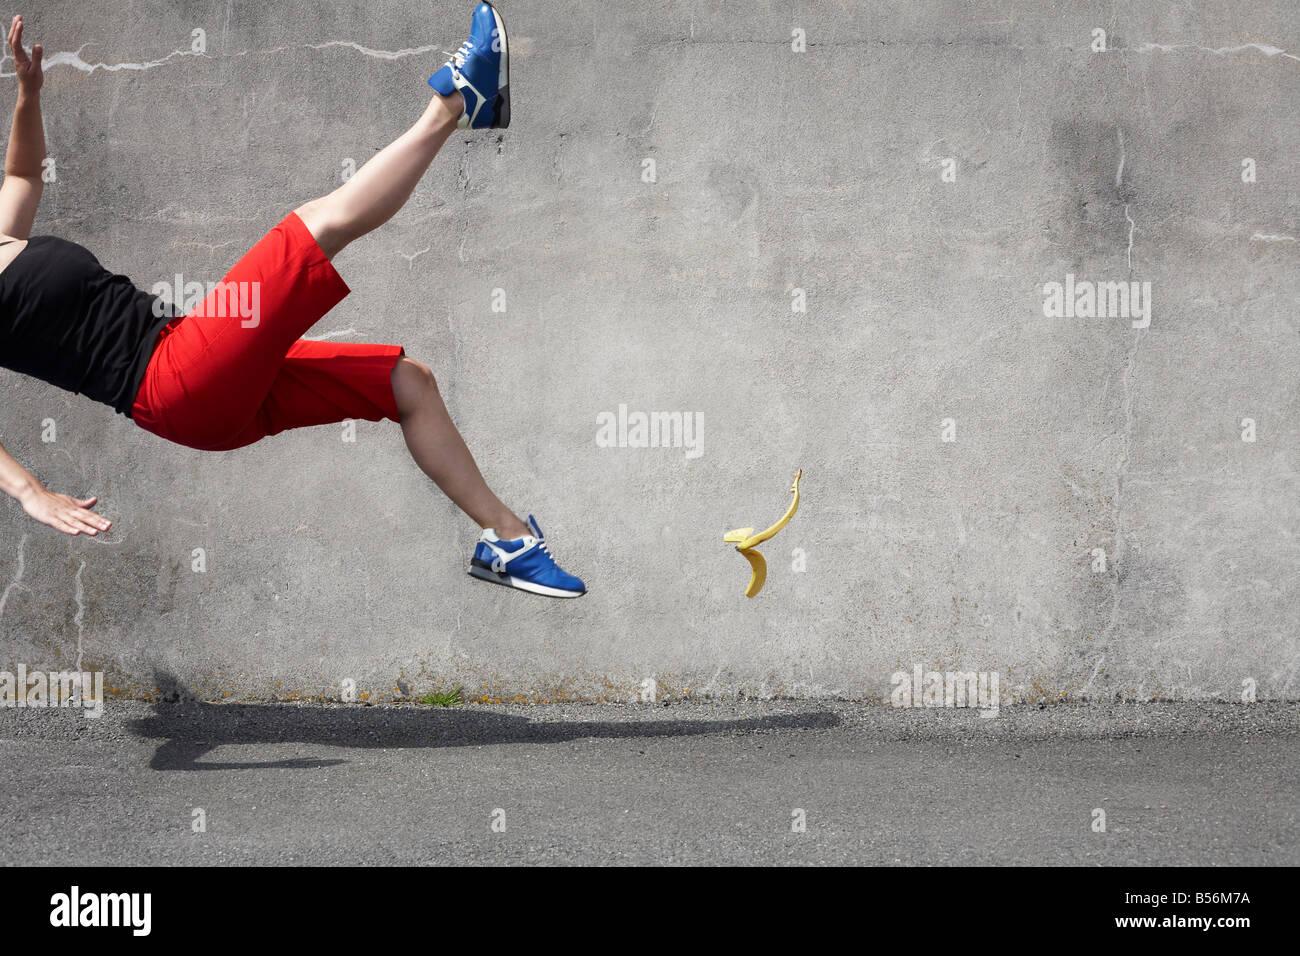 Woman falling on a banana skin - Stock Image